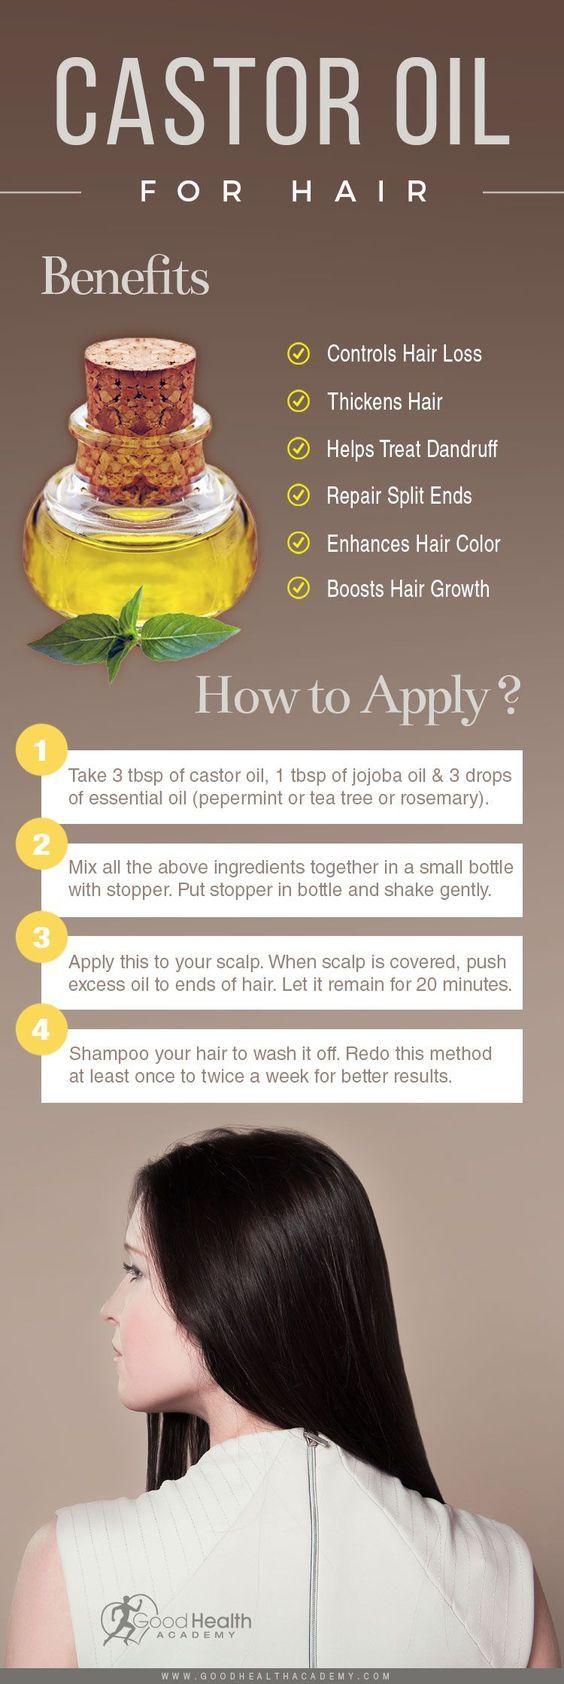 Castor oil contains natural compounds that promote hair growth. It provides nour...